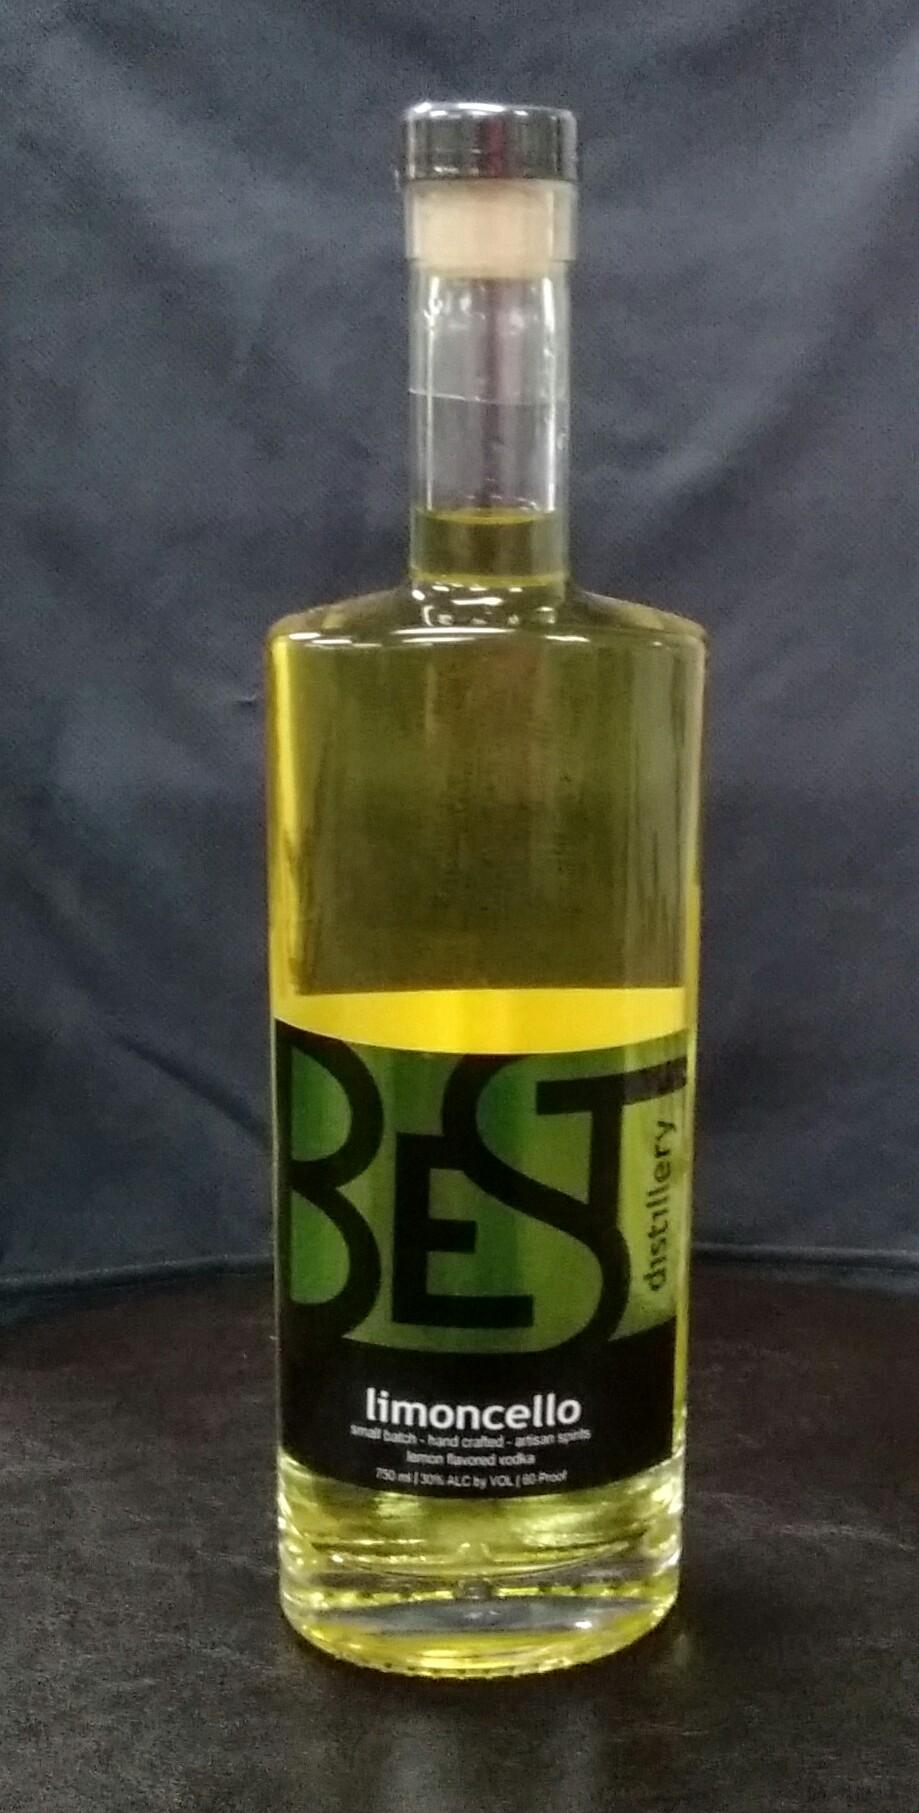 BEST Distillery Limoncello Elizabethtown, Indiana